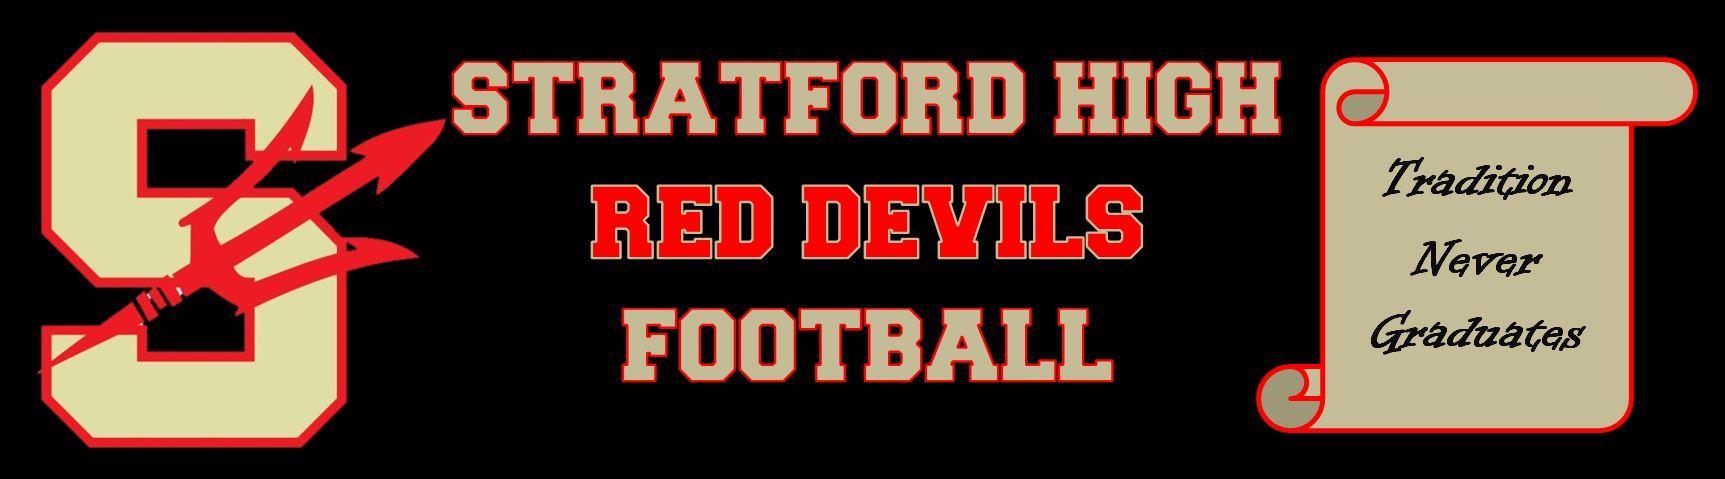 Stratford High School Football, Football, Point, Field